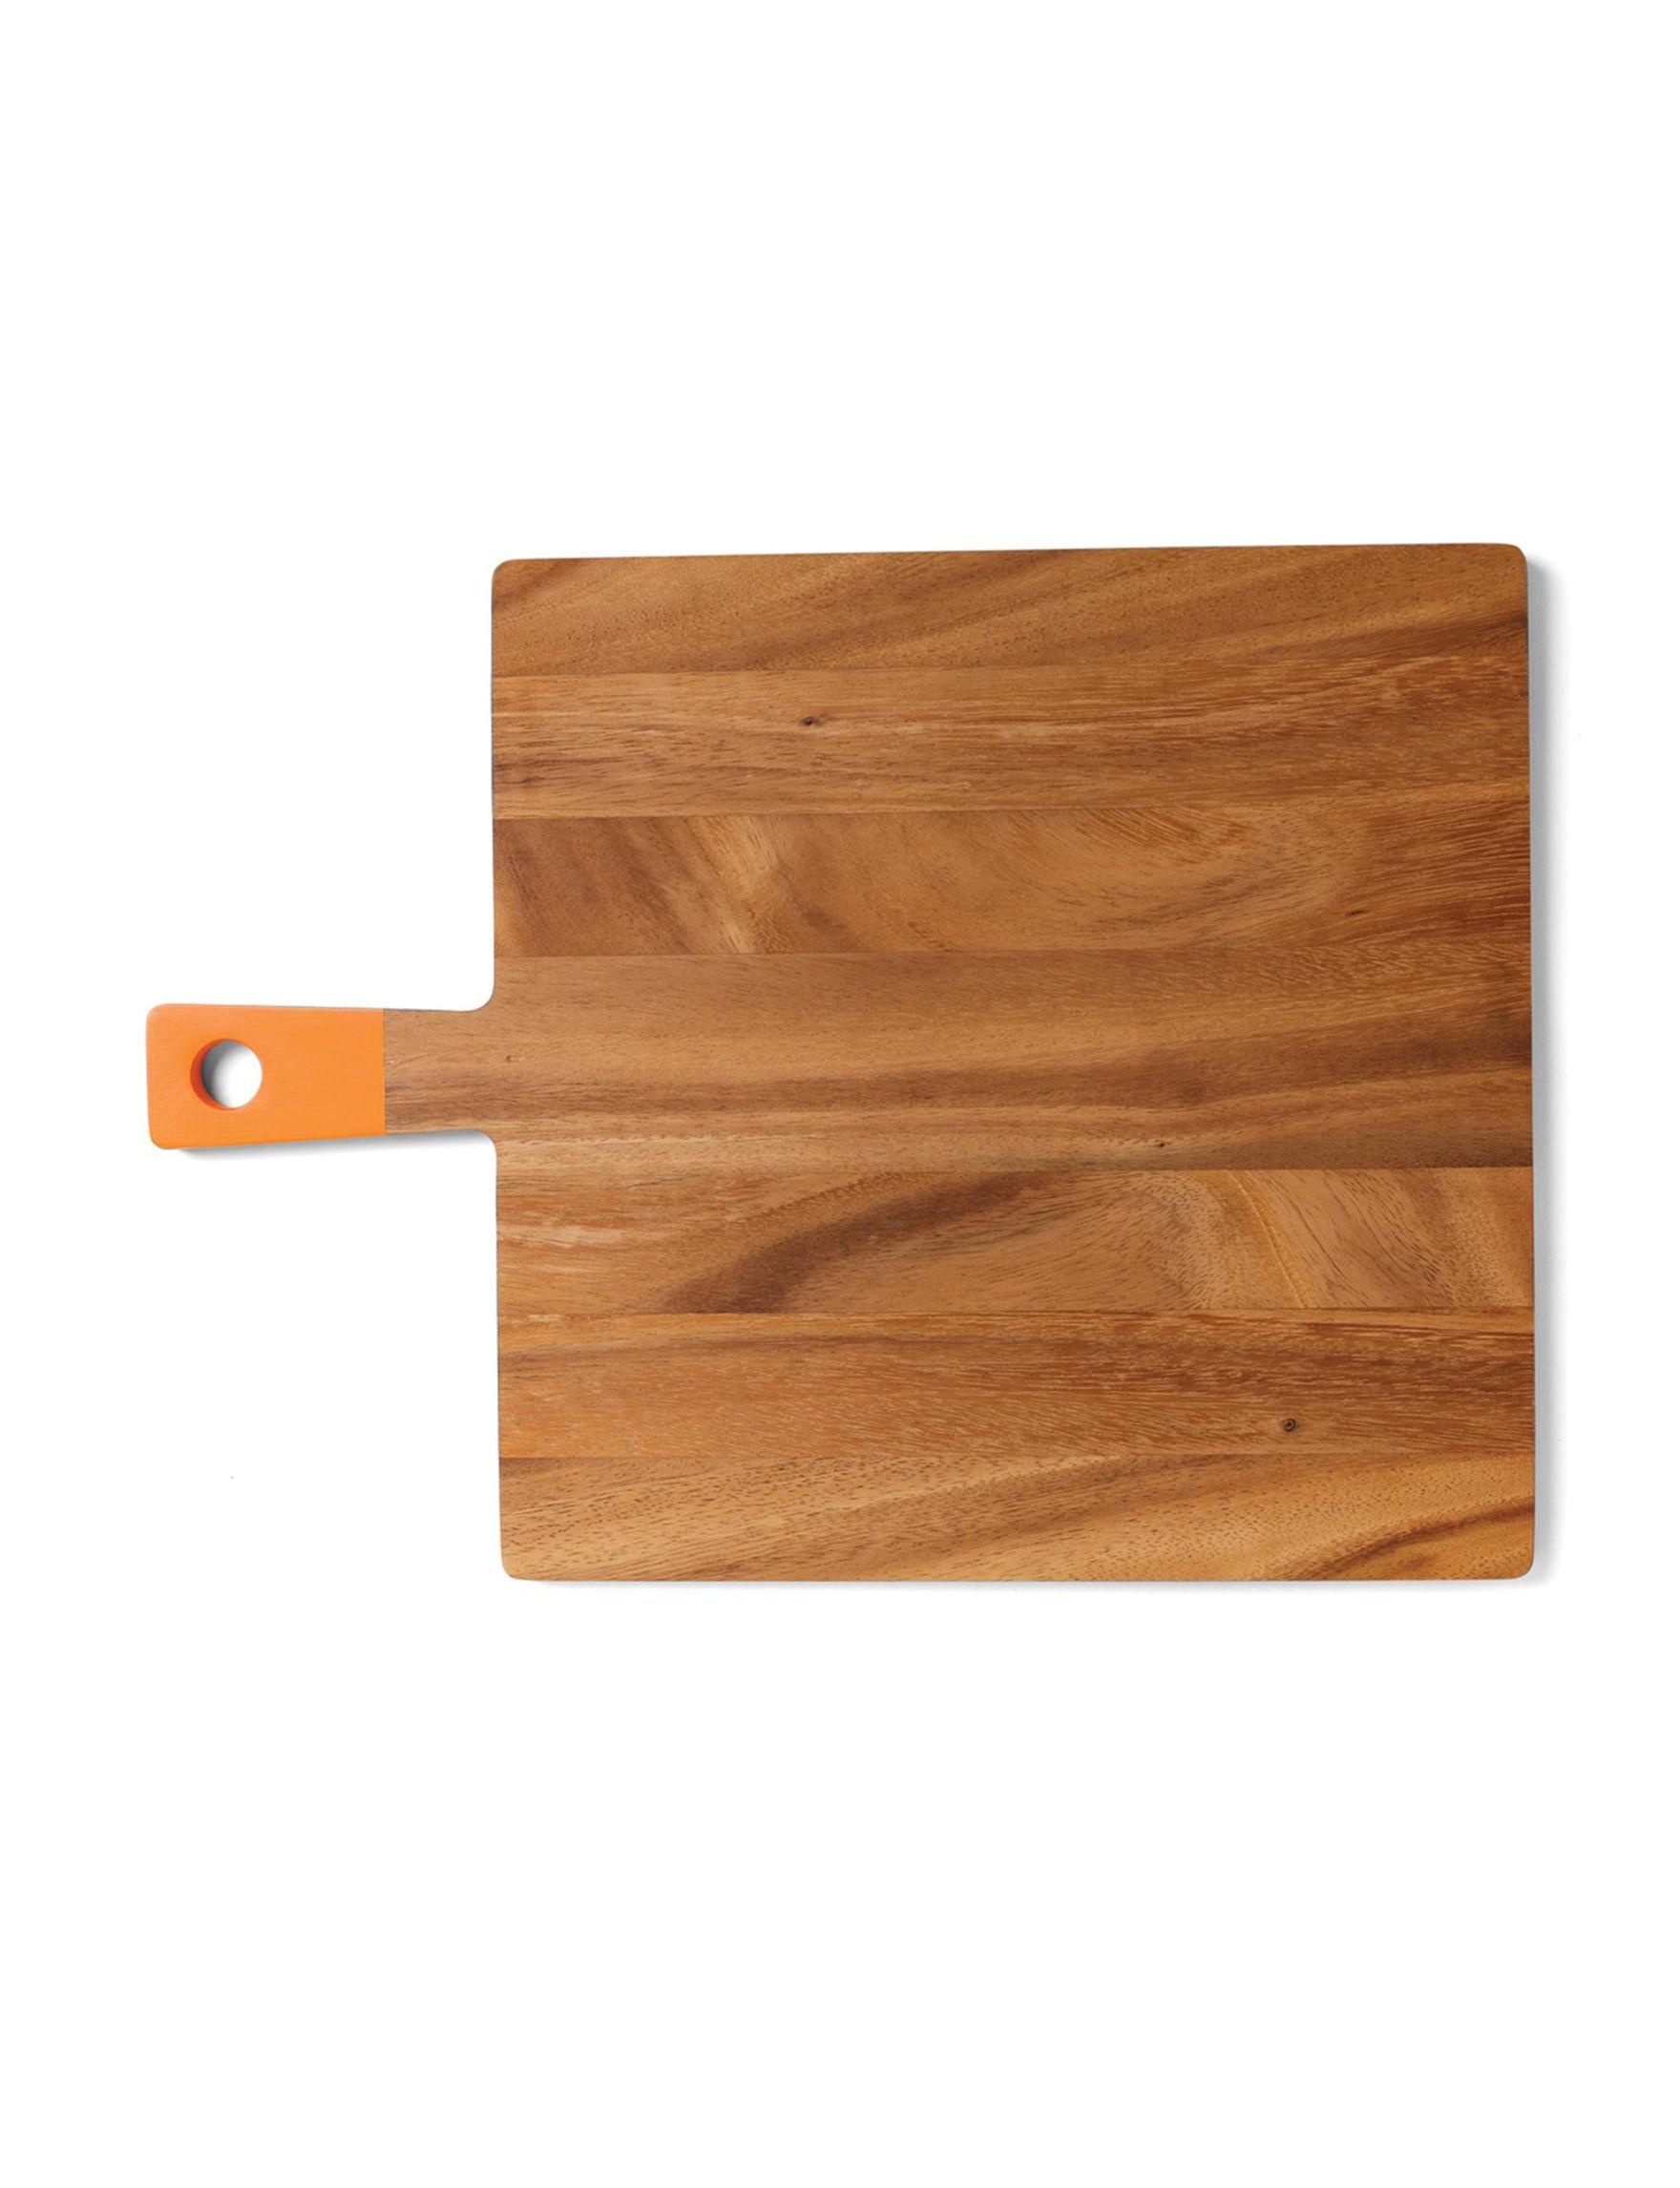 Ironwood Gourmet Brown Cheese Boards Cutting Boards Prep & Tools Serveware